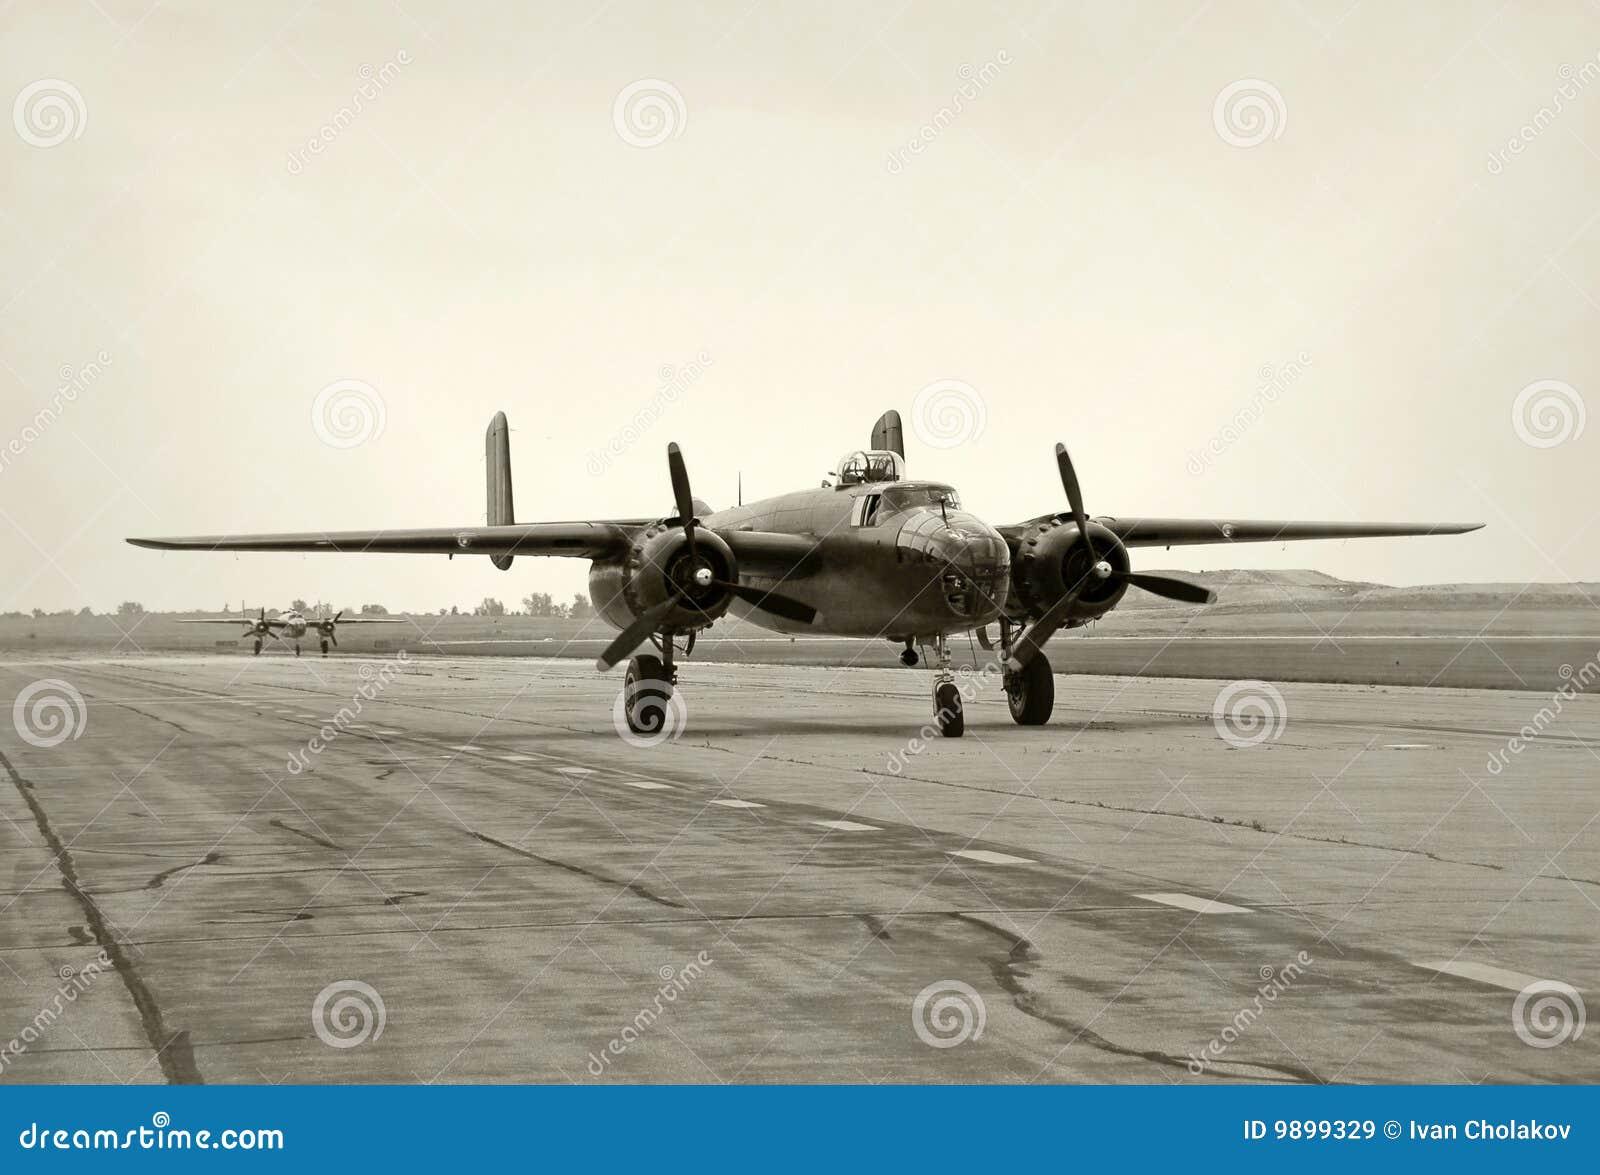 World War II era bombers